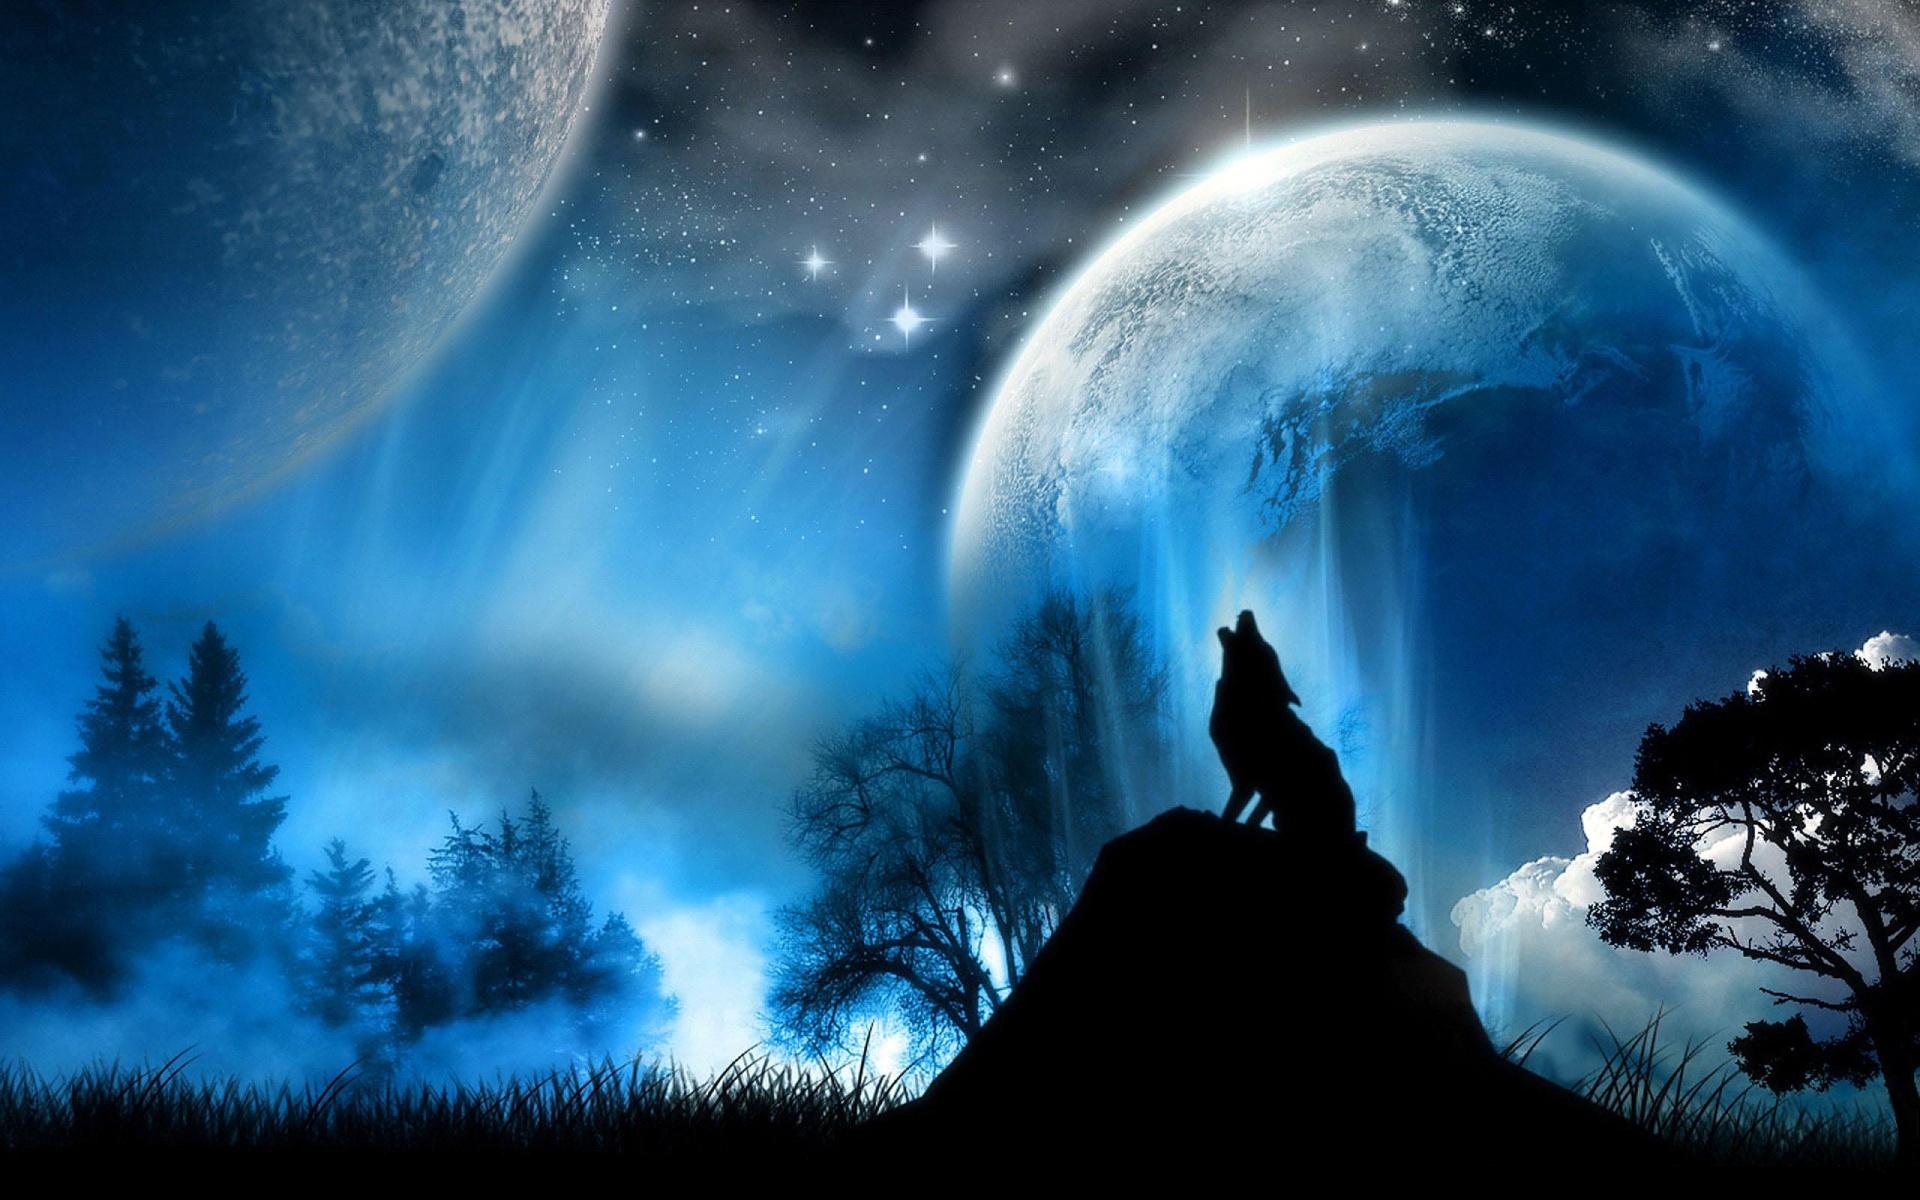 Fantasy wallpaper universe wolf 1920x1200